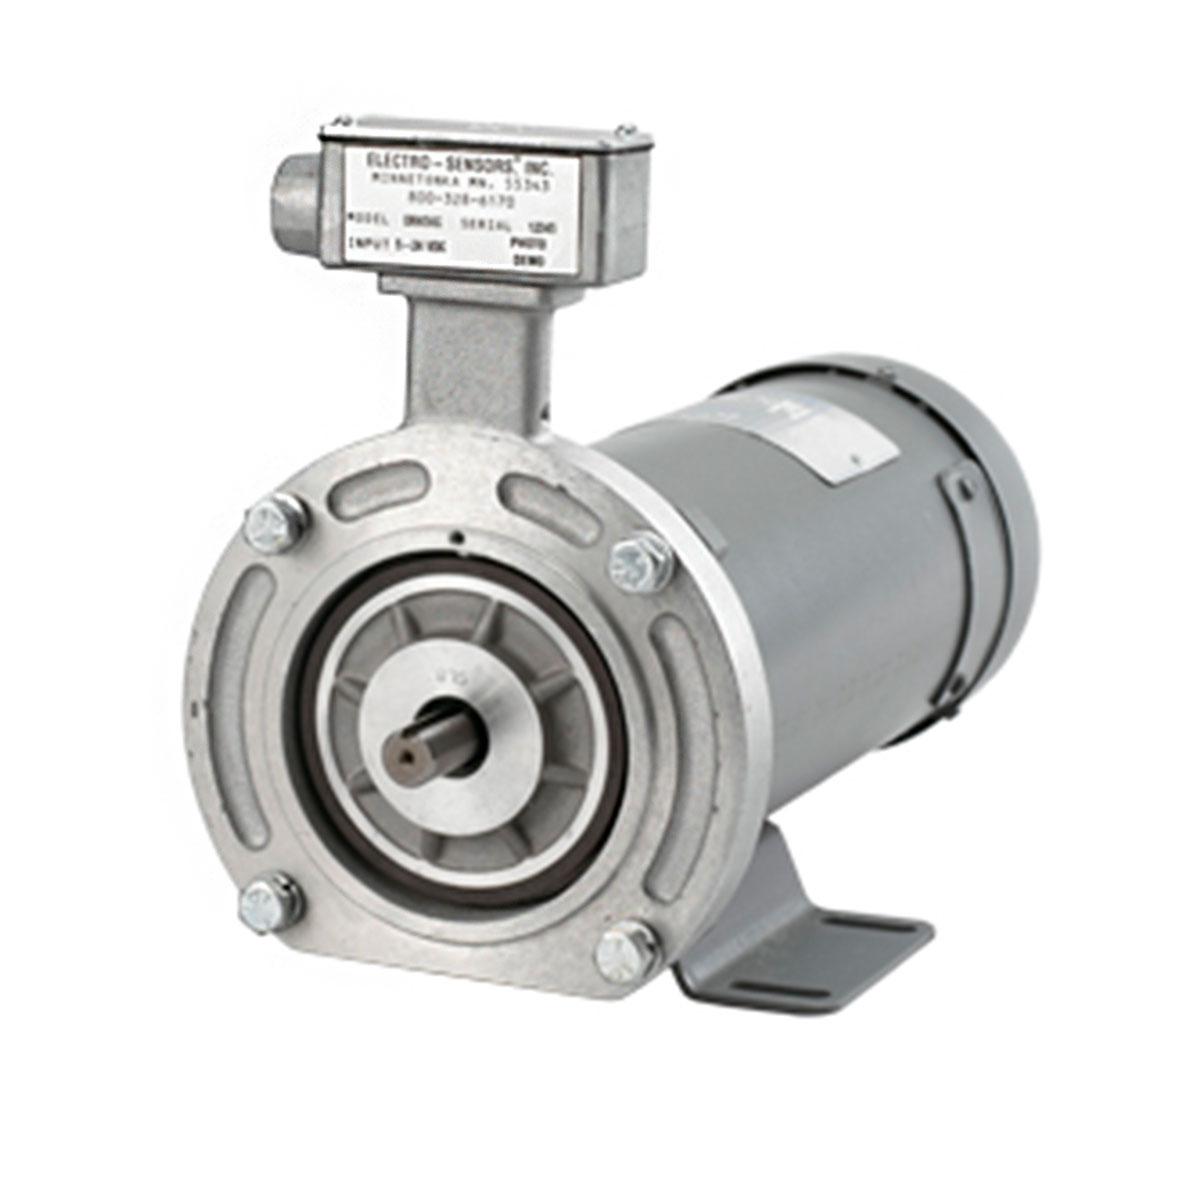 Electro-Sensors_DRK182TC_BHD